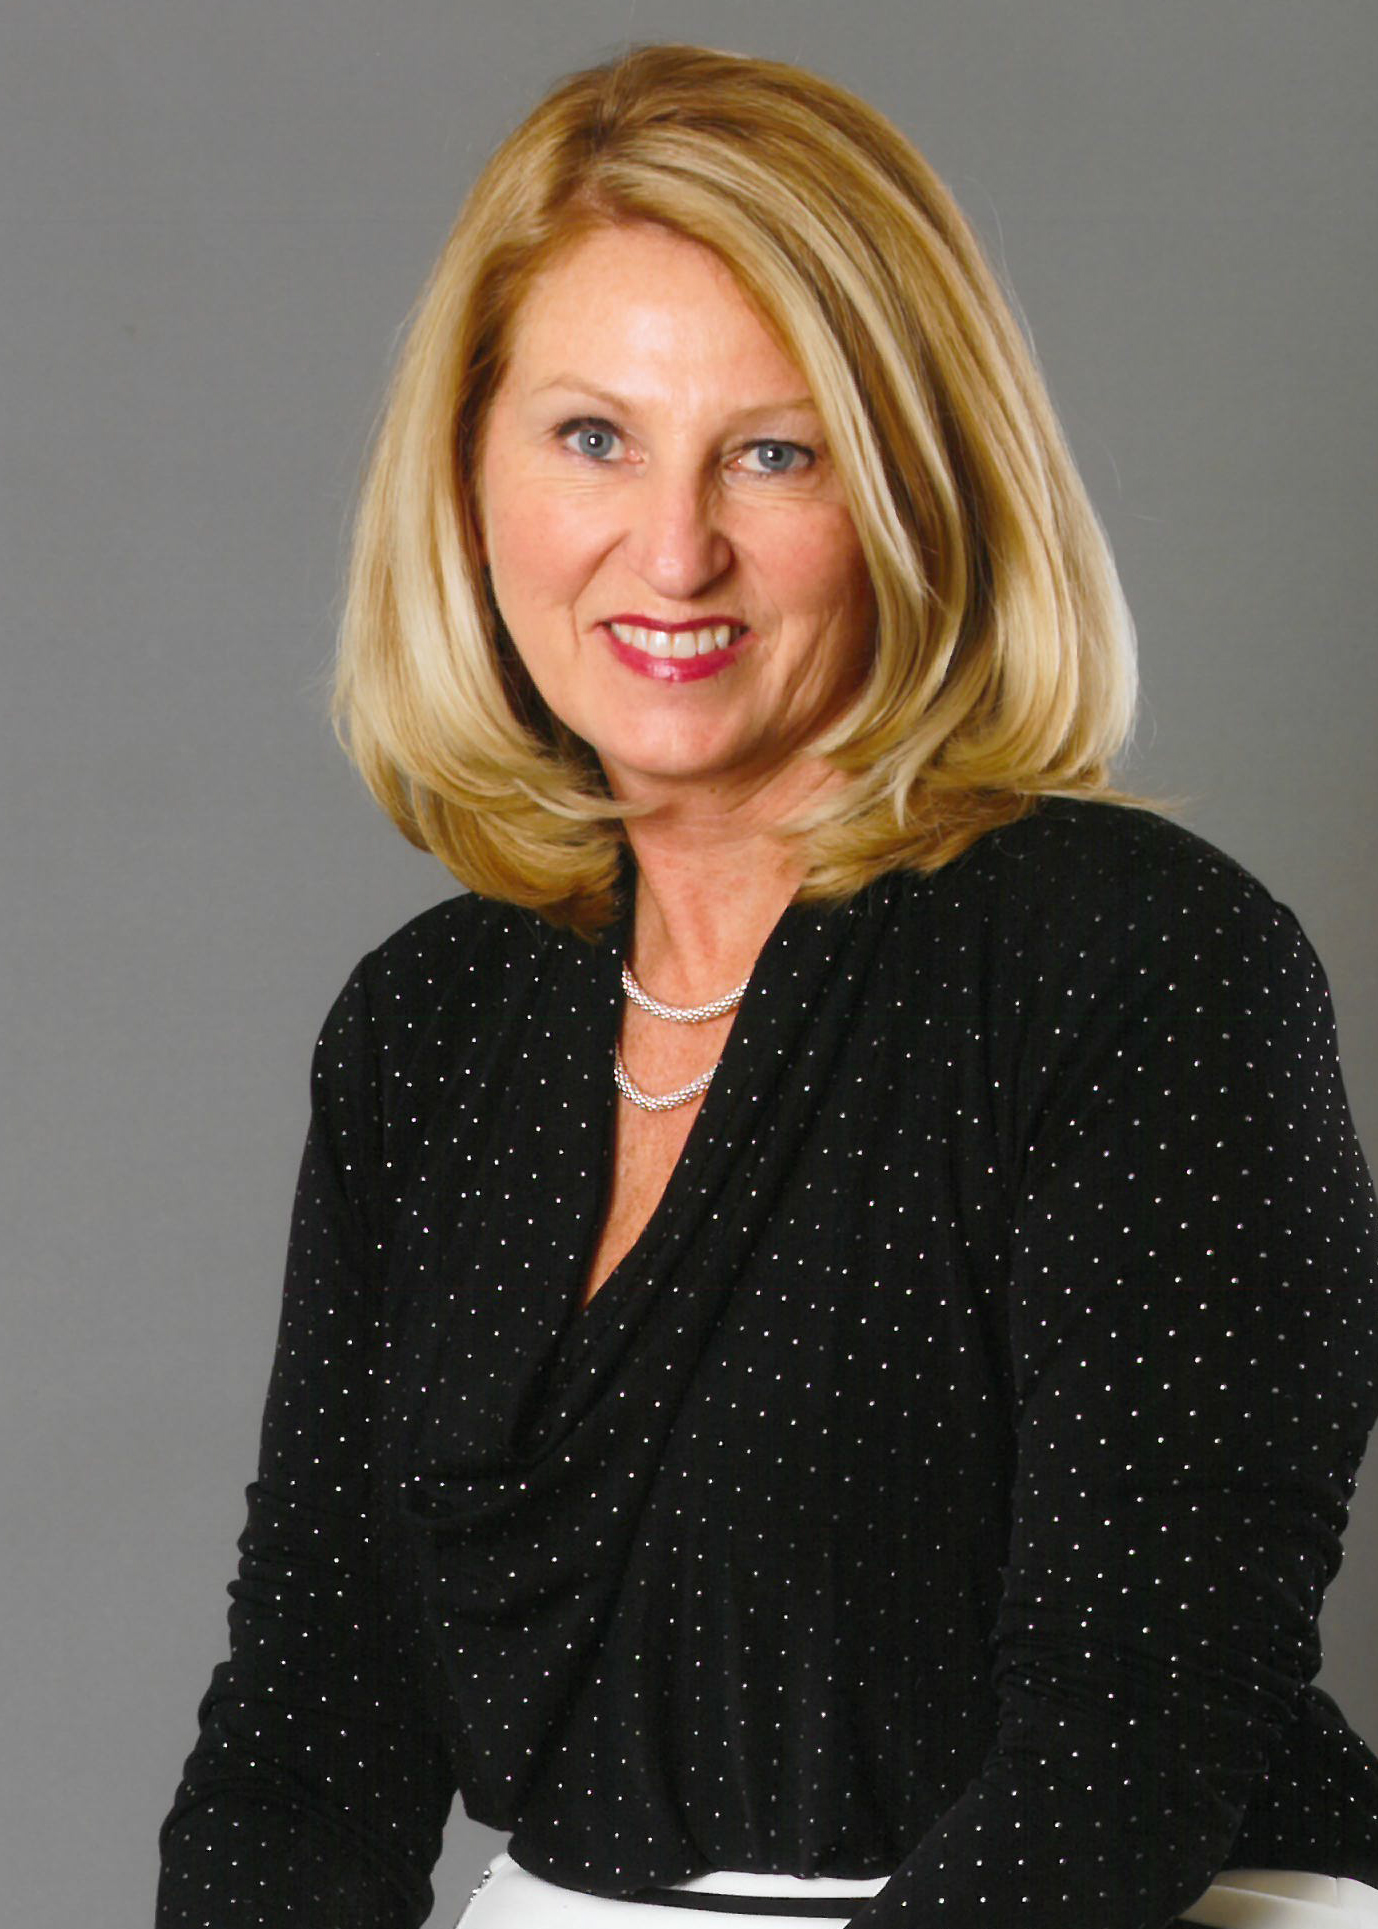 image of Pam Stewart